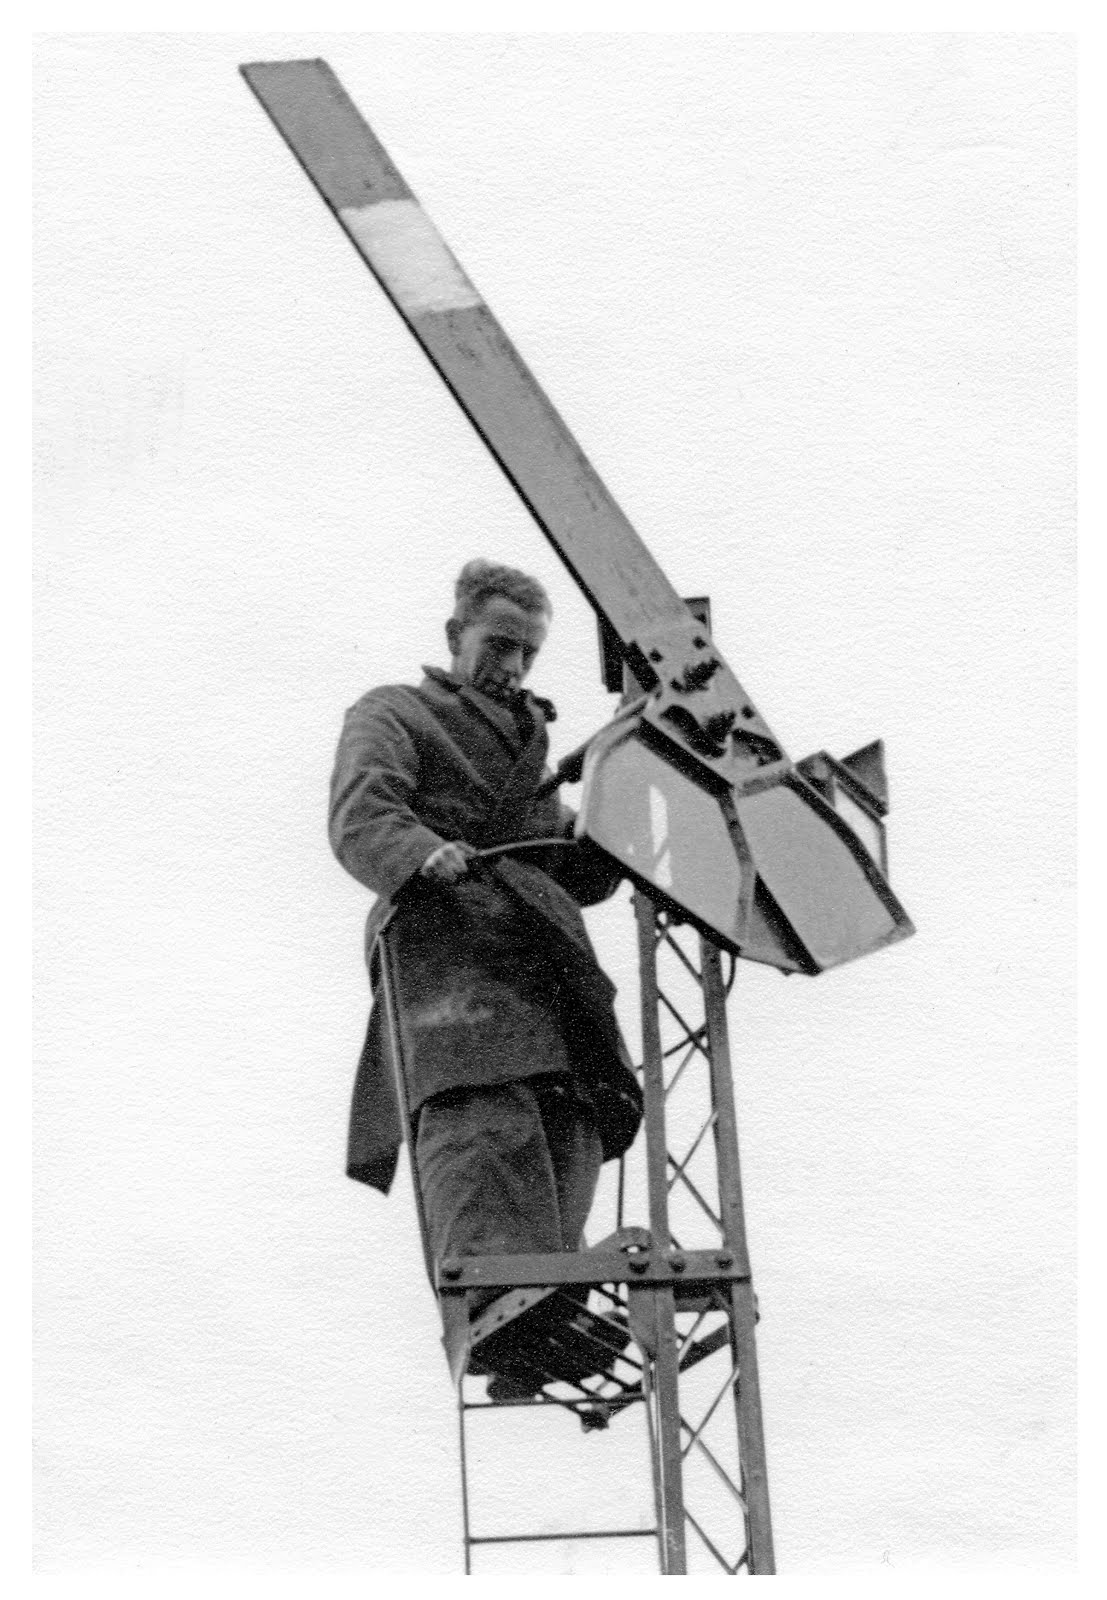 Brockhurst signal post